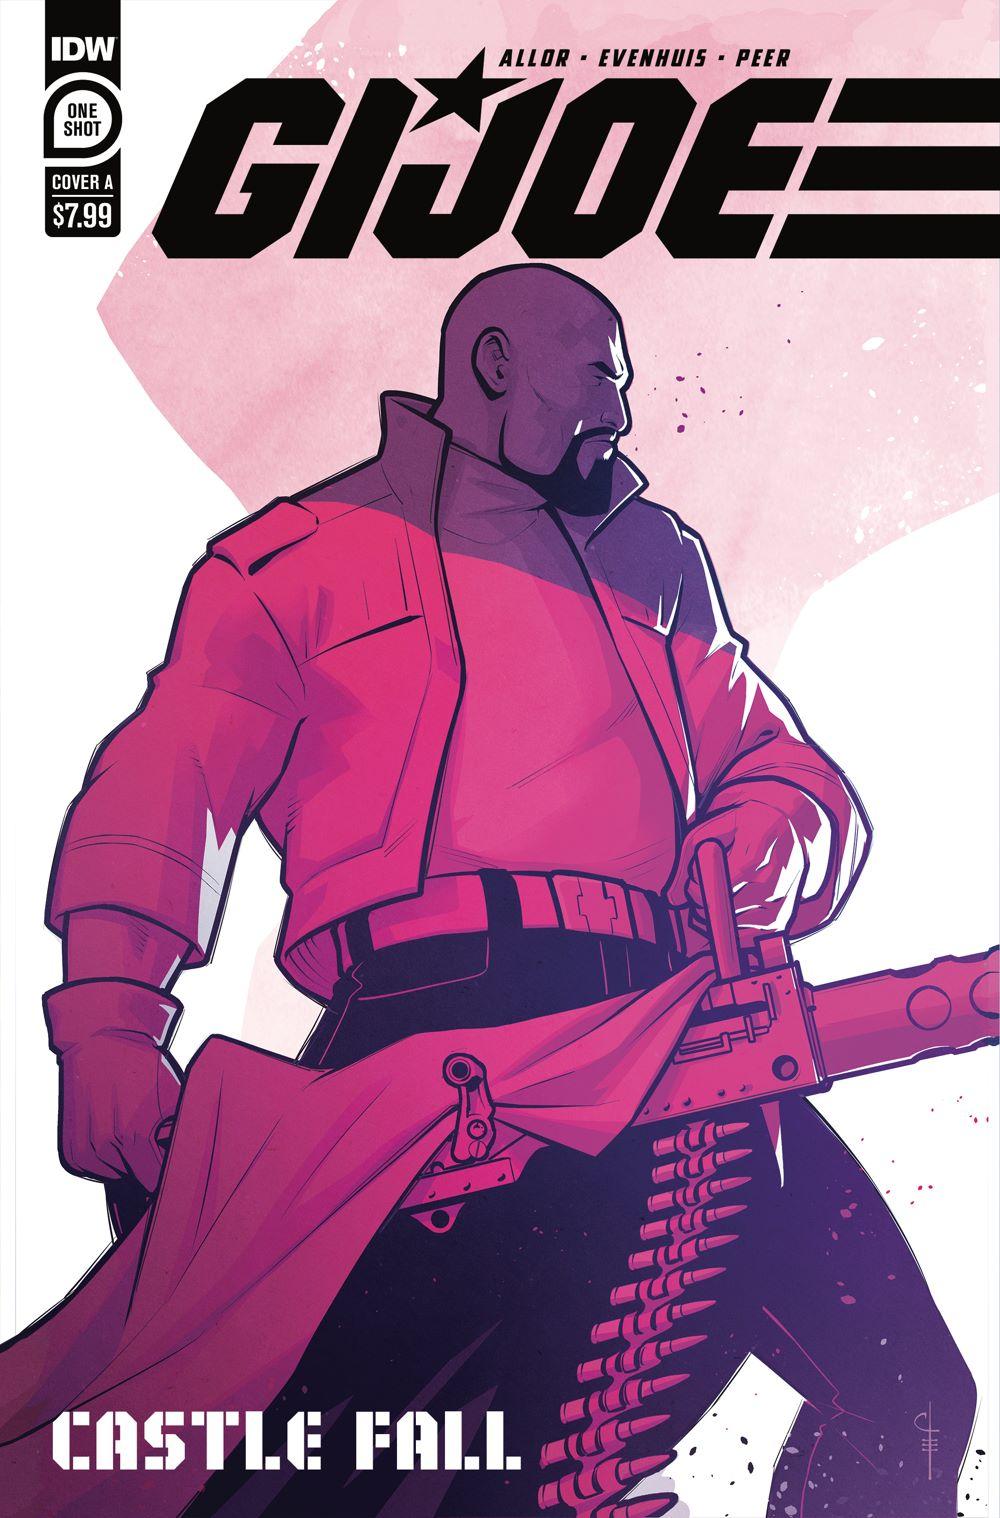 GIJoe_CastleFall01-coverA ComicList Previews: G.I. JOE CASTLE FALL #1